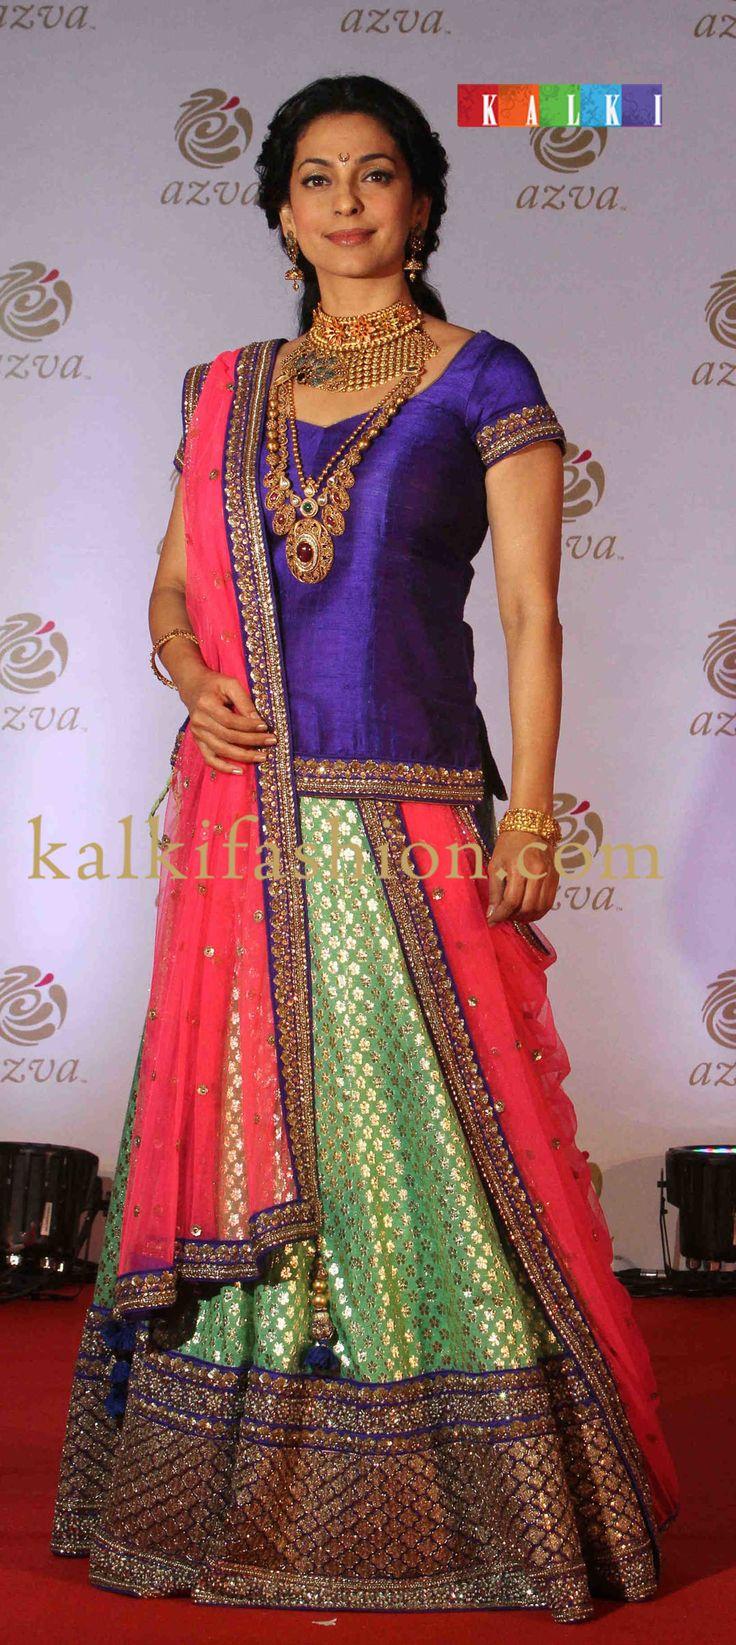 http://www.kalkifashion.com/  Juhi Chawlabeingthe guest of honor at Azva Jewellery in green and pink lehenga by  Bharti Brahmbhatt.